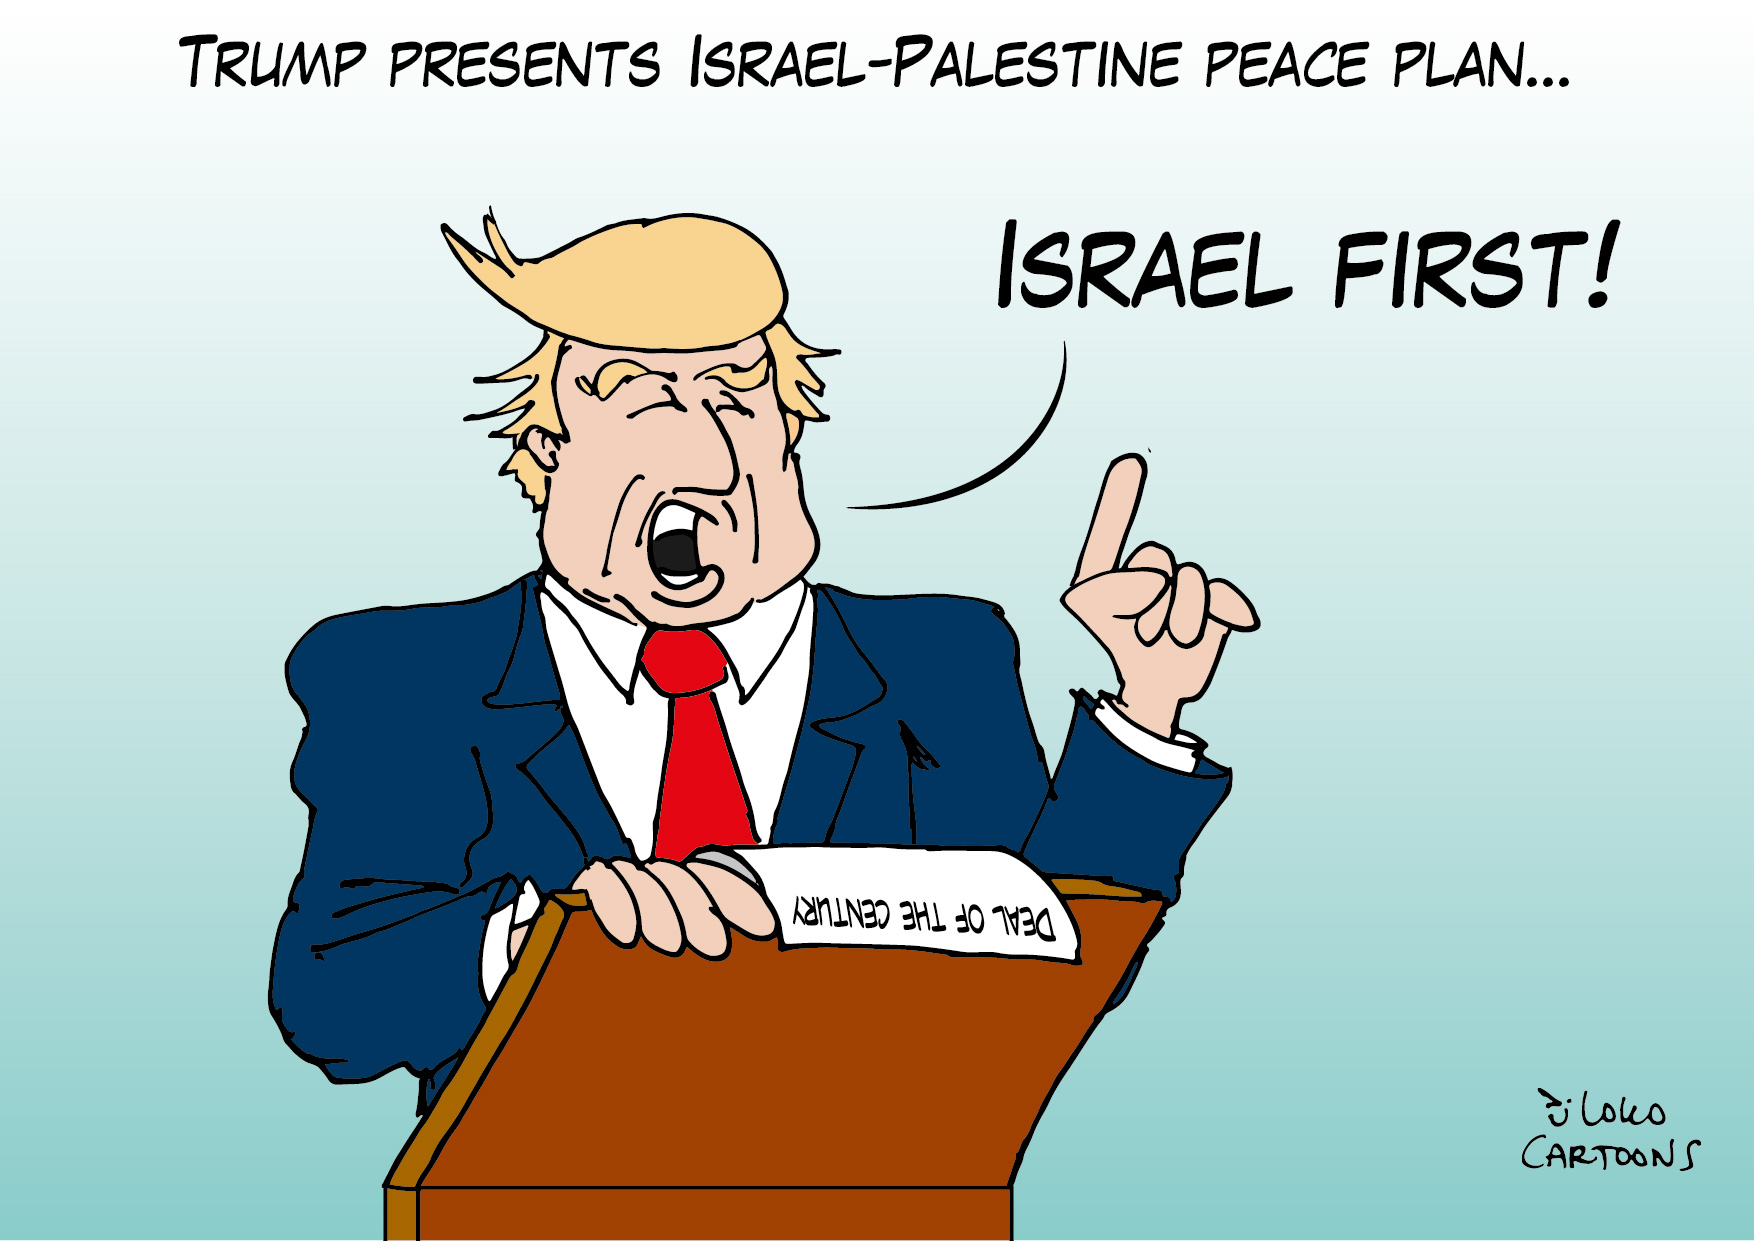 Trump presents Israel-Palestine peace plan…